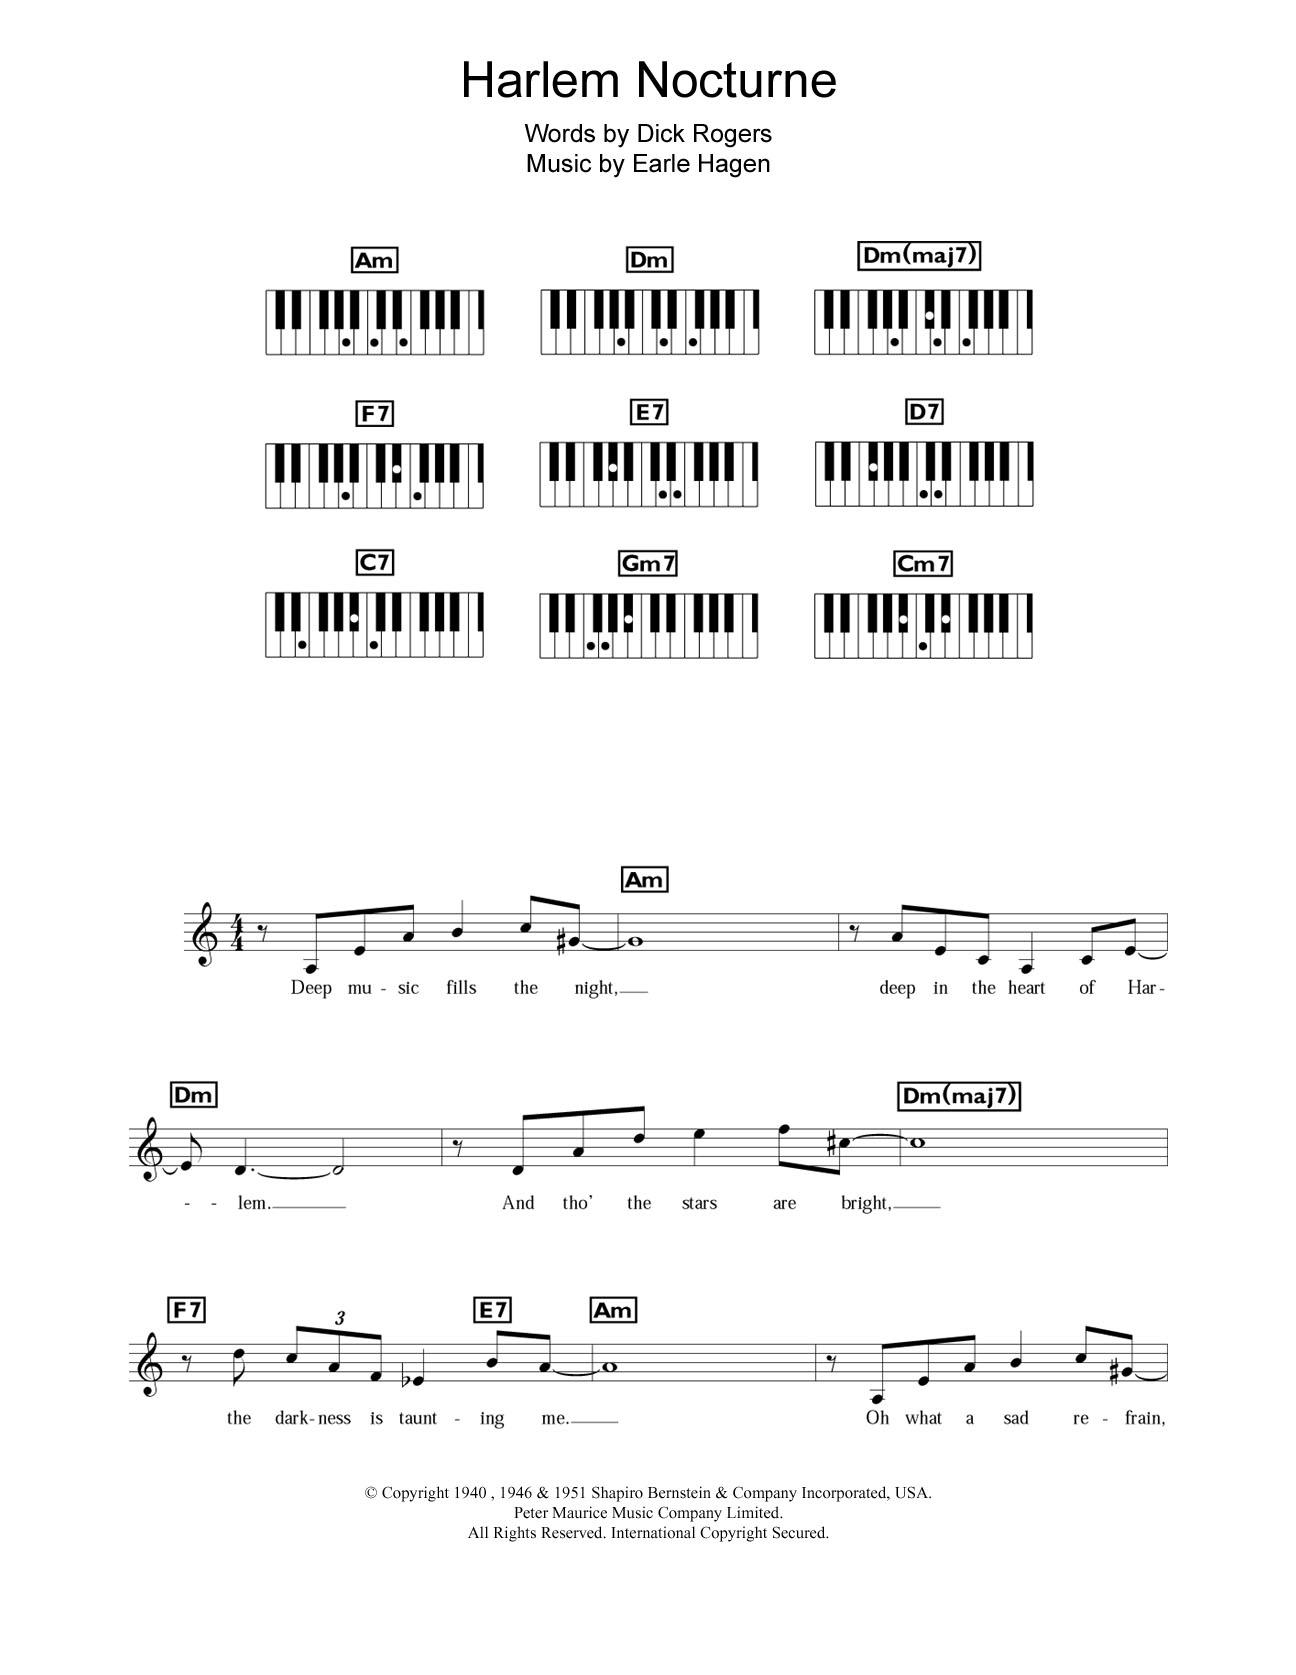 Duke Ellington - Harlem Nocturne